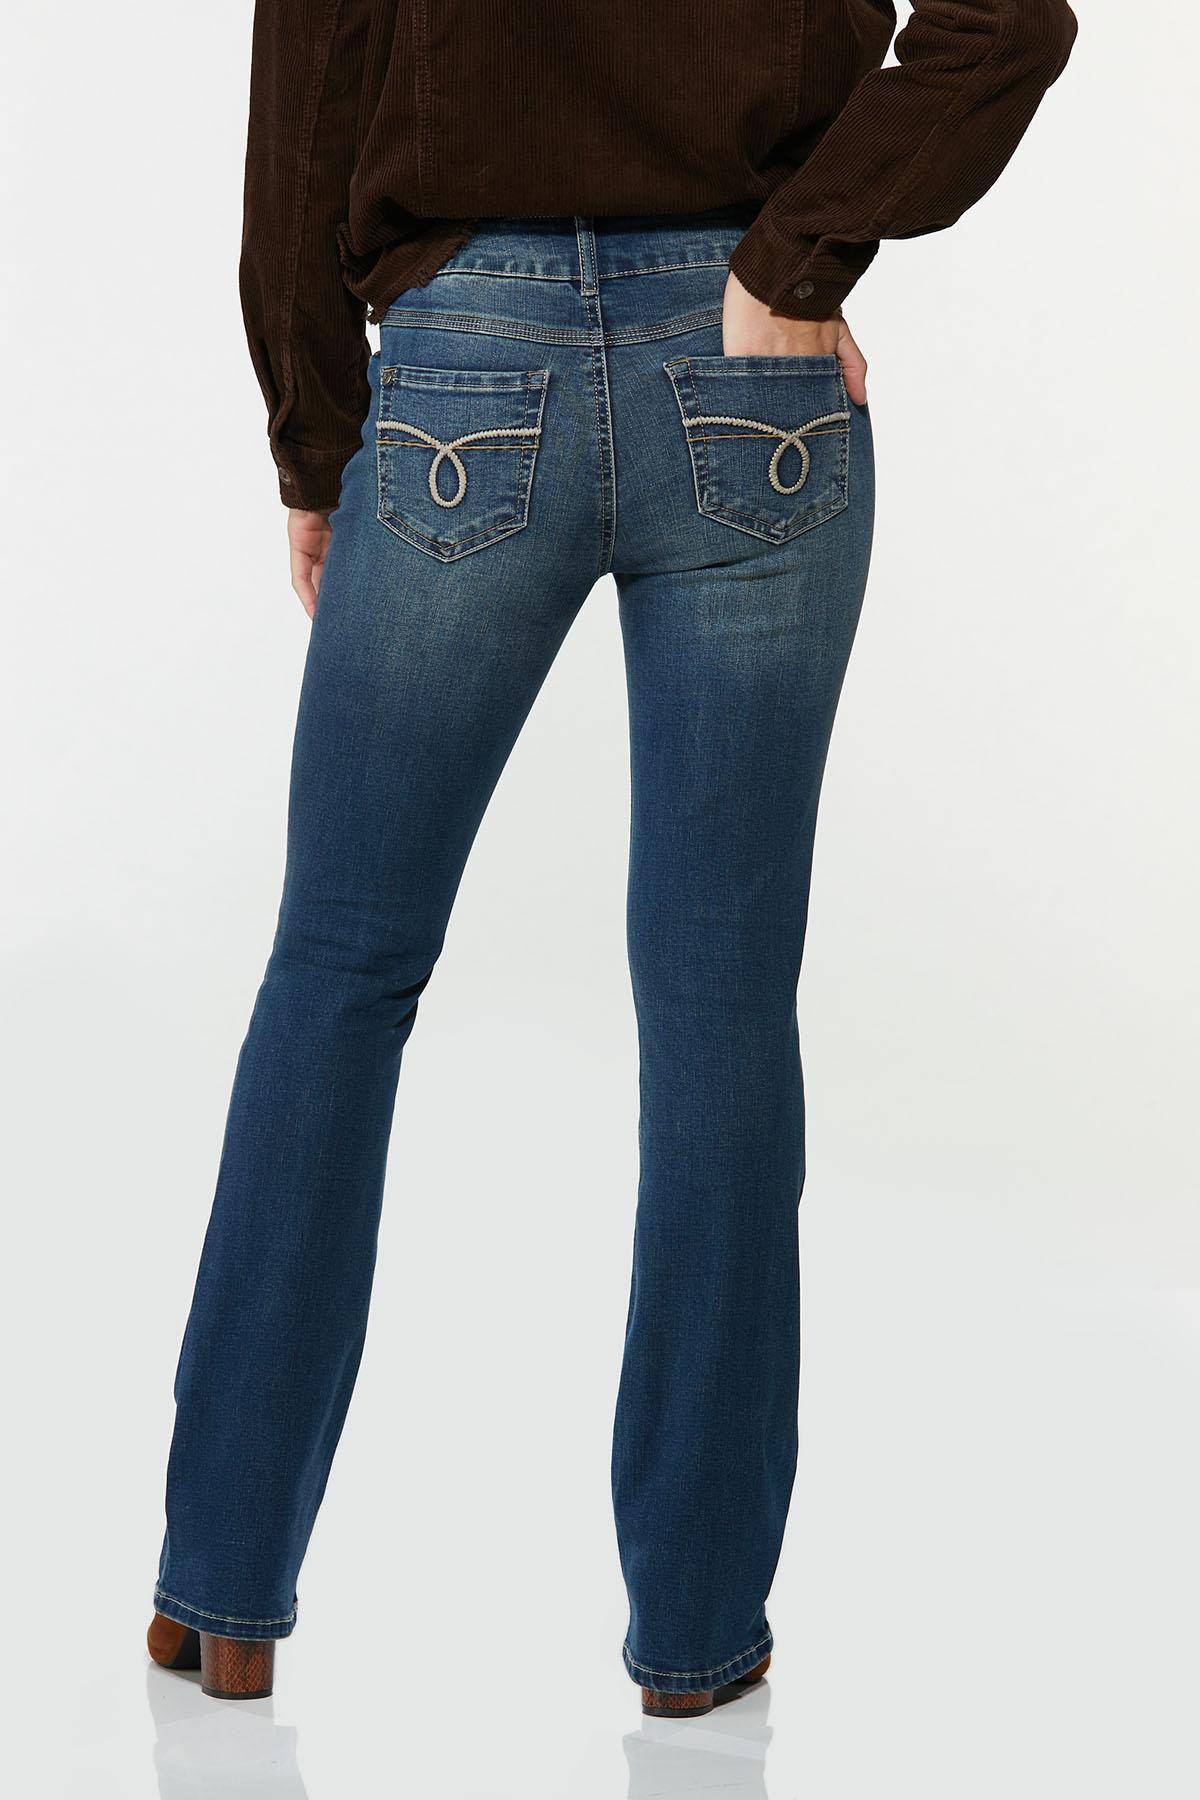 Slimming Bootcut Jeans (Item #44693245)